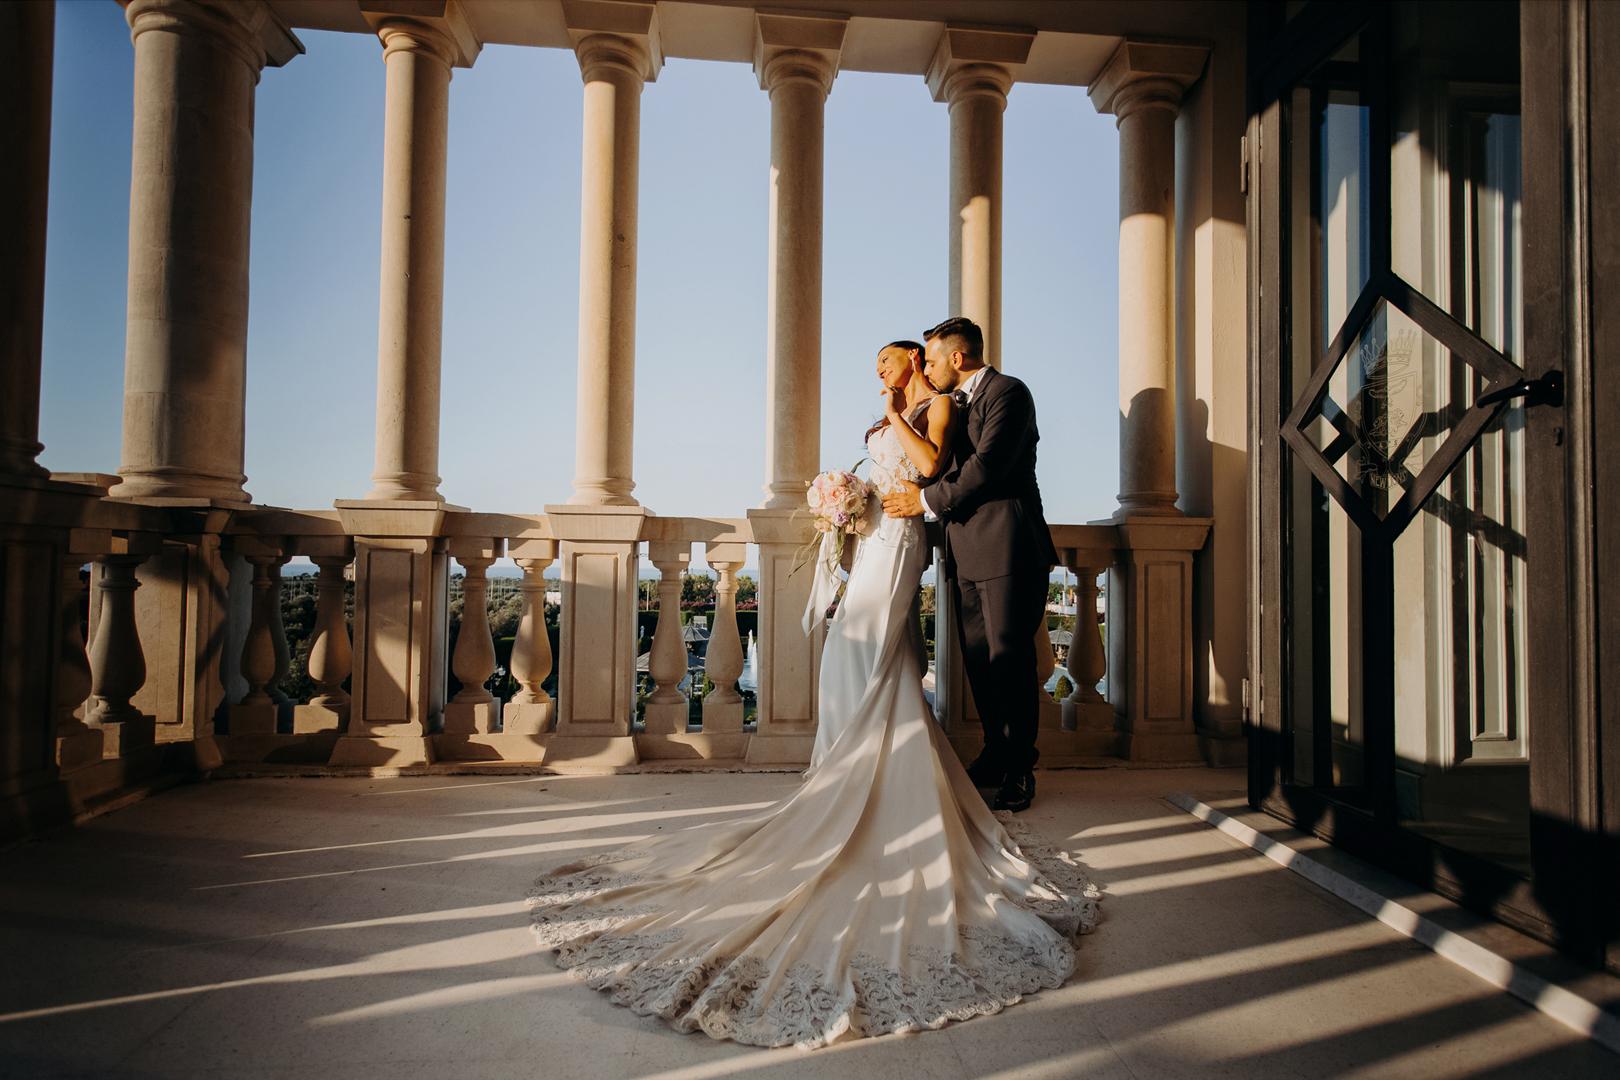 35 gianni-lepore-fotografo-lucera-sposi-reportage-bride-groom-weddingday